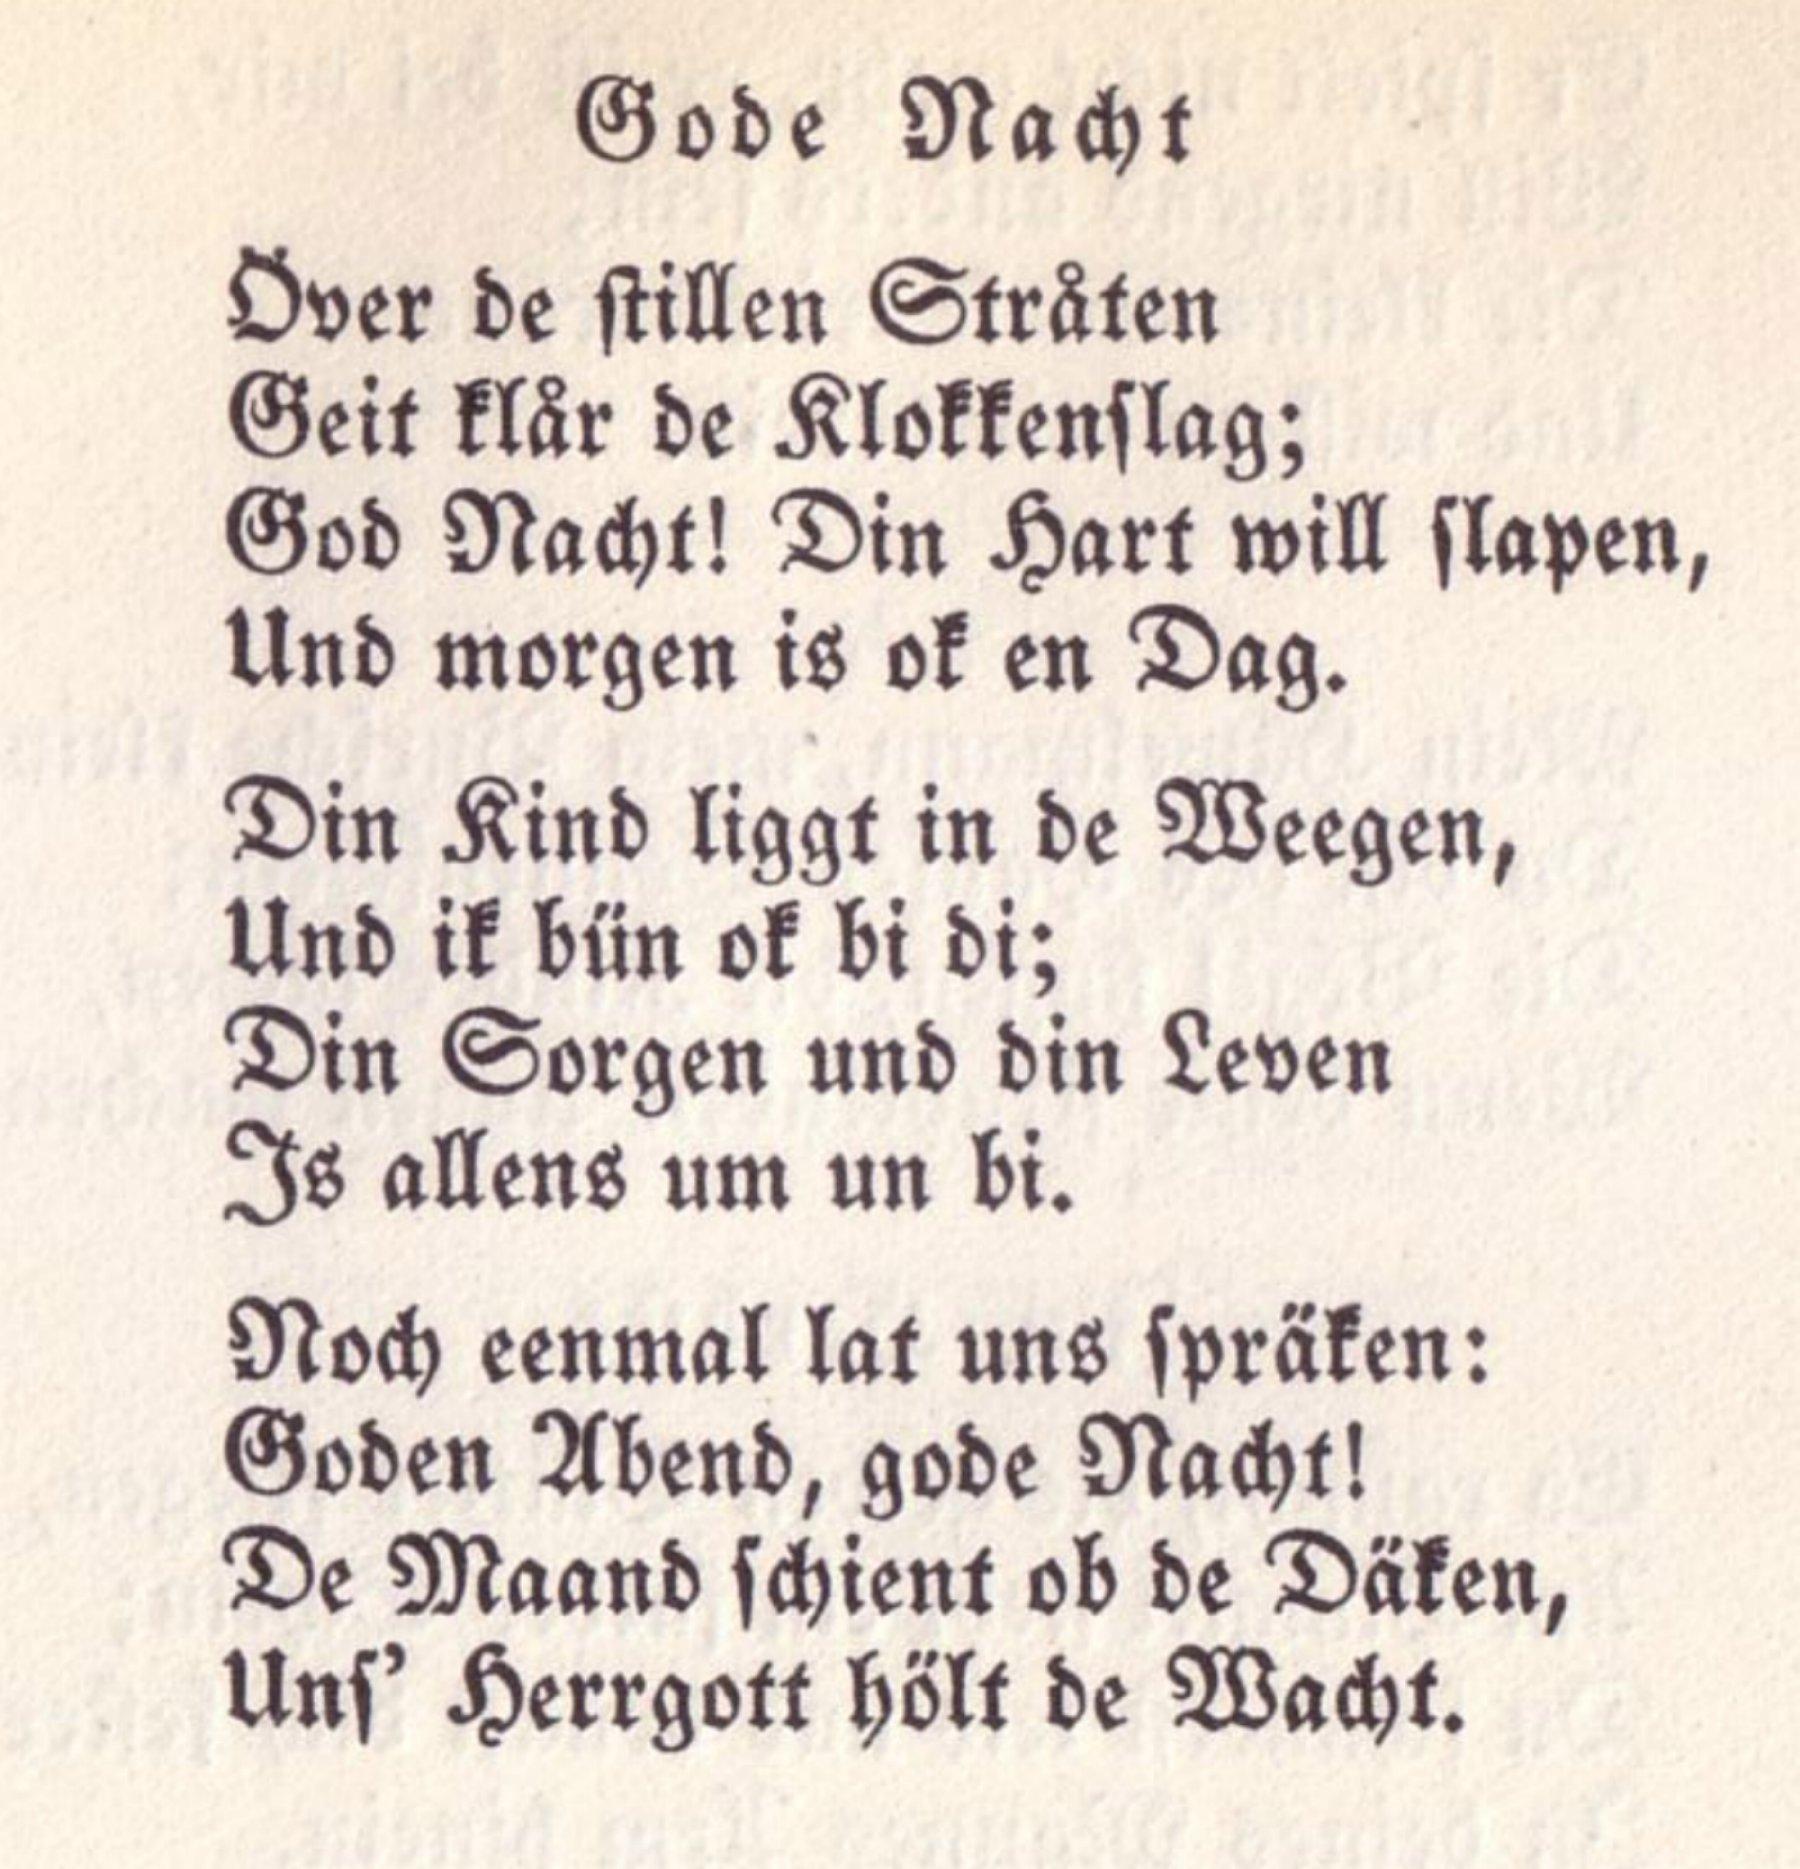 """Gode Nacht"""